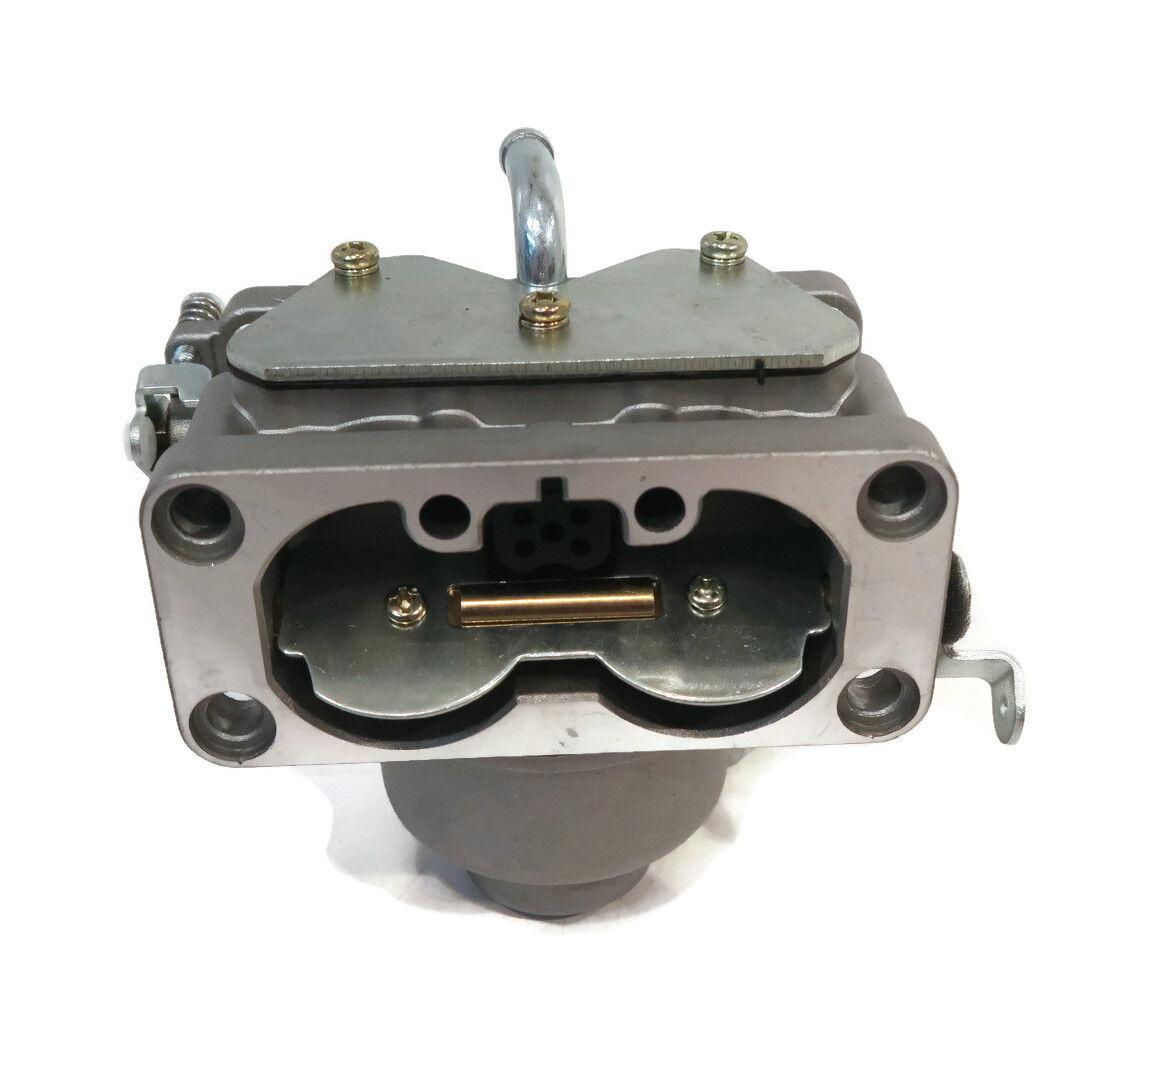 John Deere Tractor Carburetors : Carburetor for john deere mia la